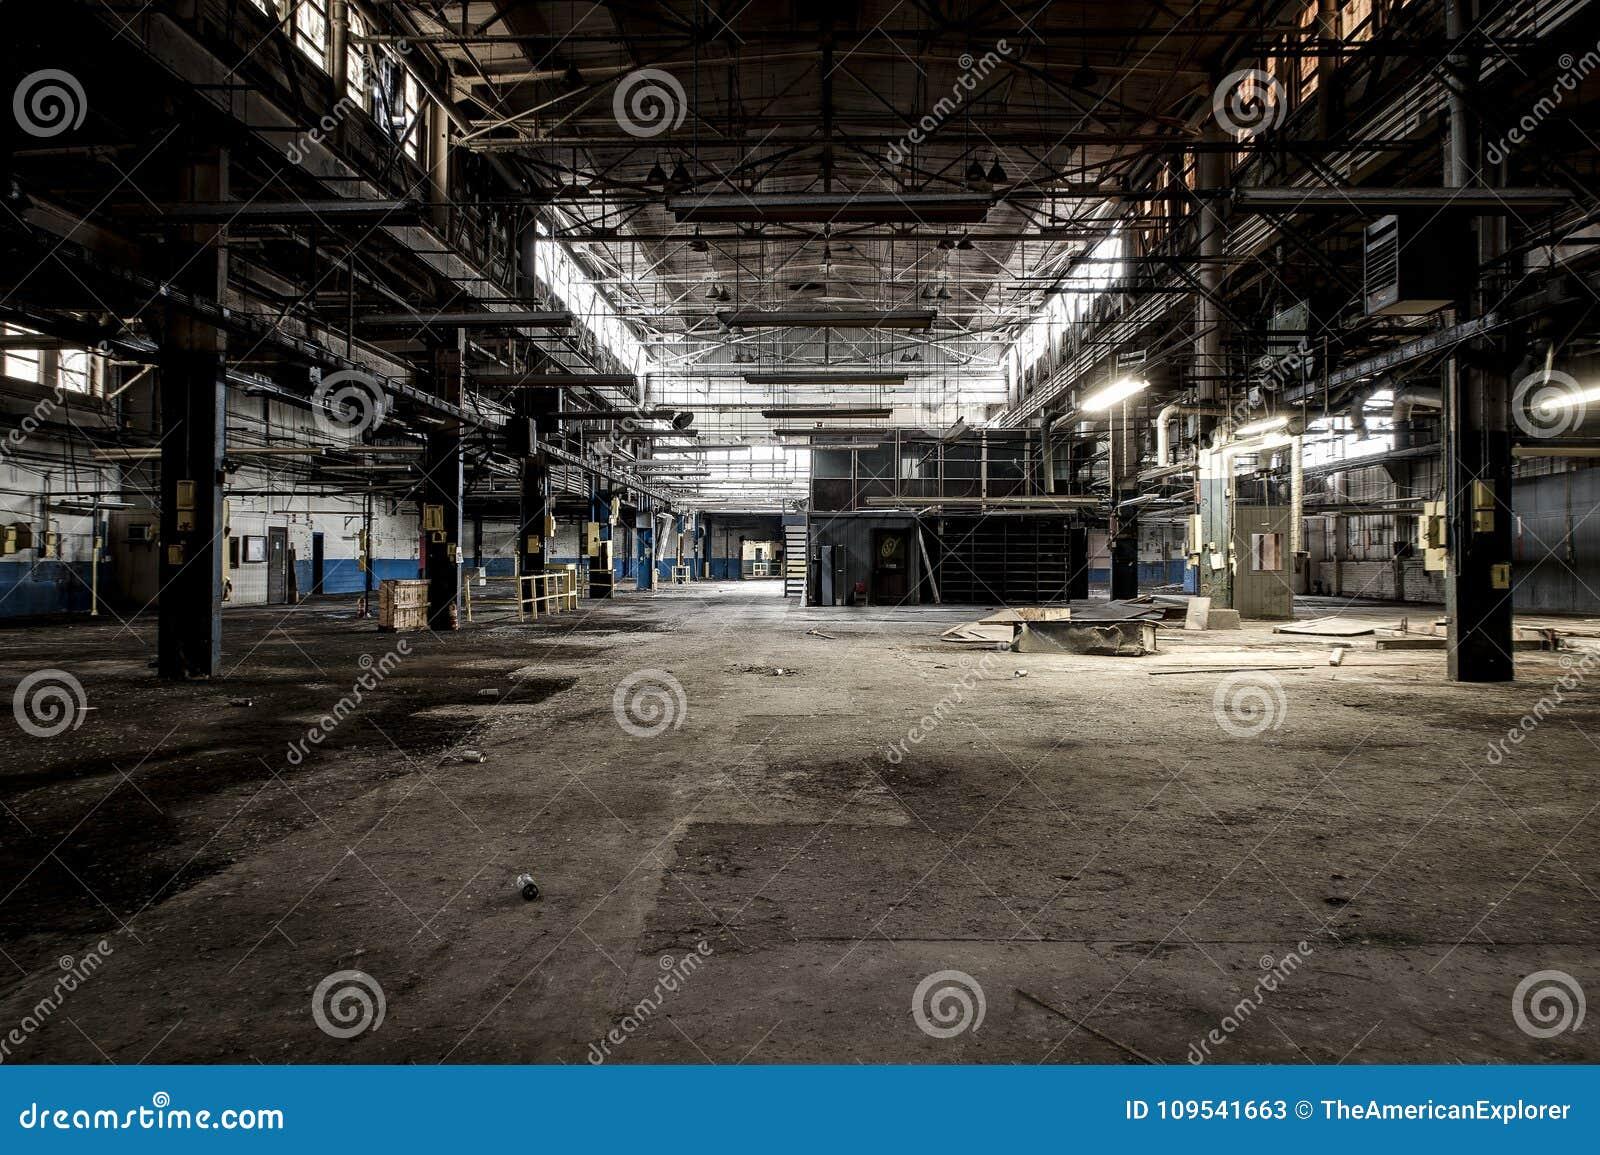 Abandoned Factory - Ferry Cap & Company - Cleveland, Ohio